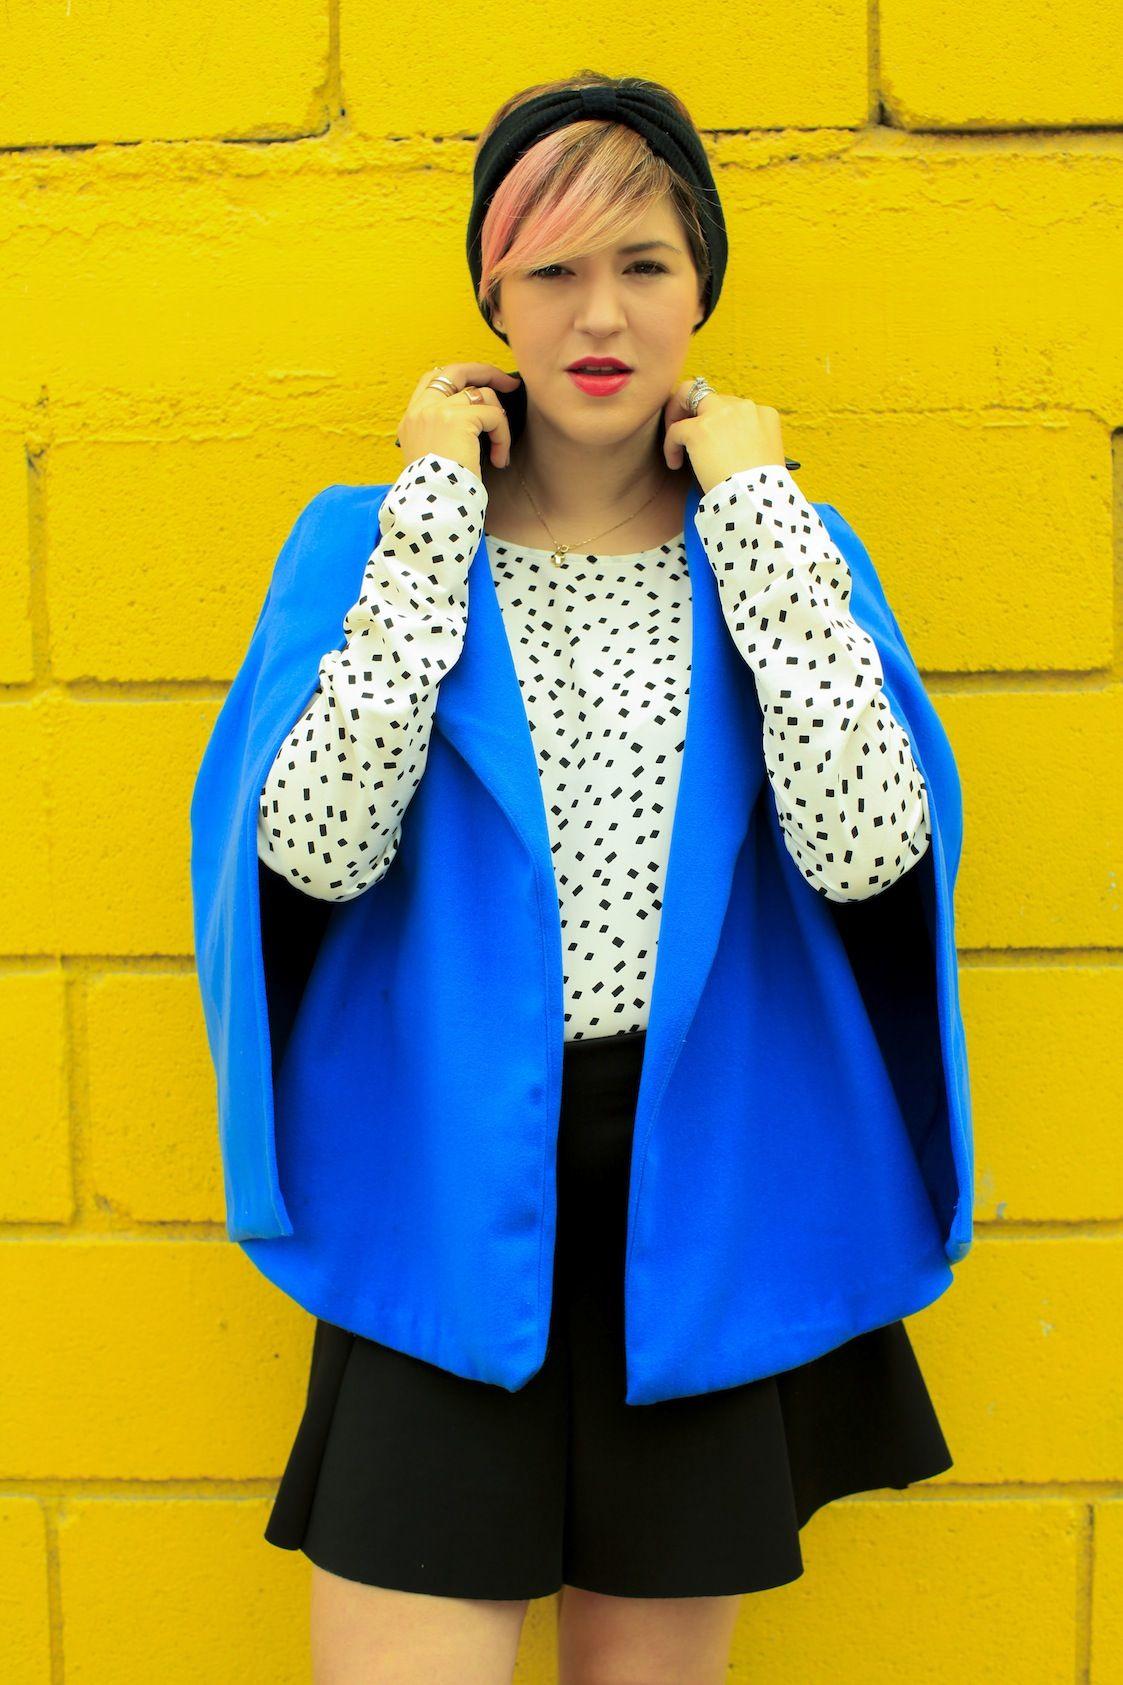 Color Spring 2014 - Mexican Fashion Blog Nancy Nannuck #yellow #blue #print